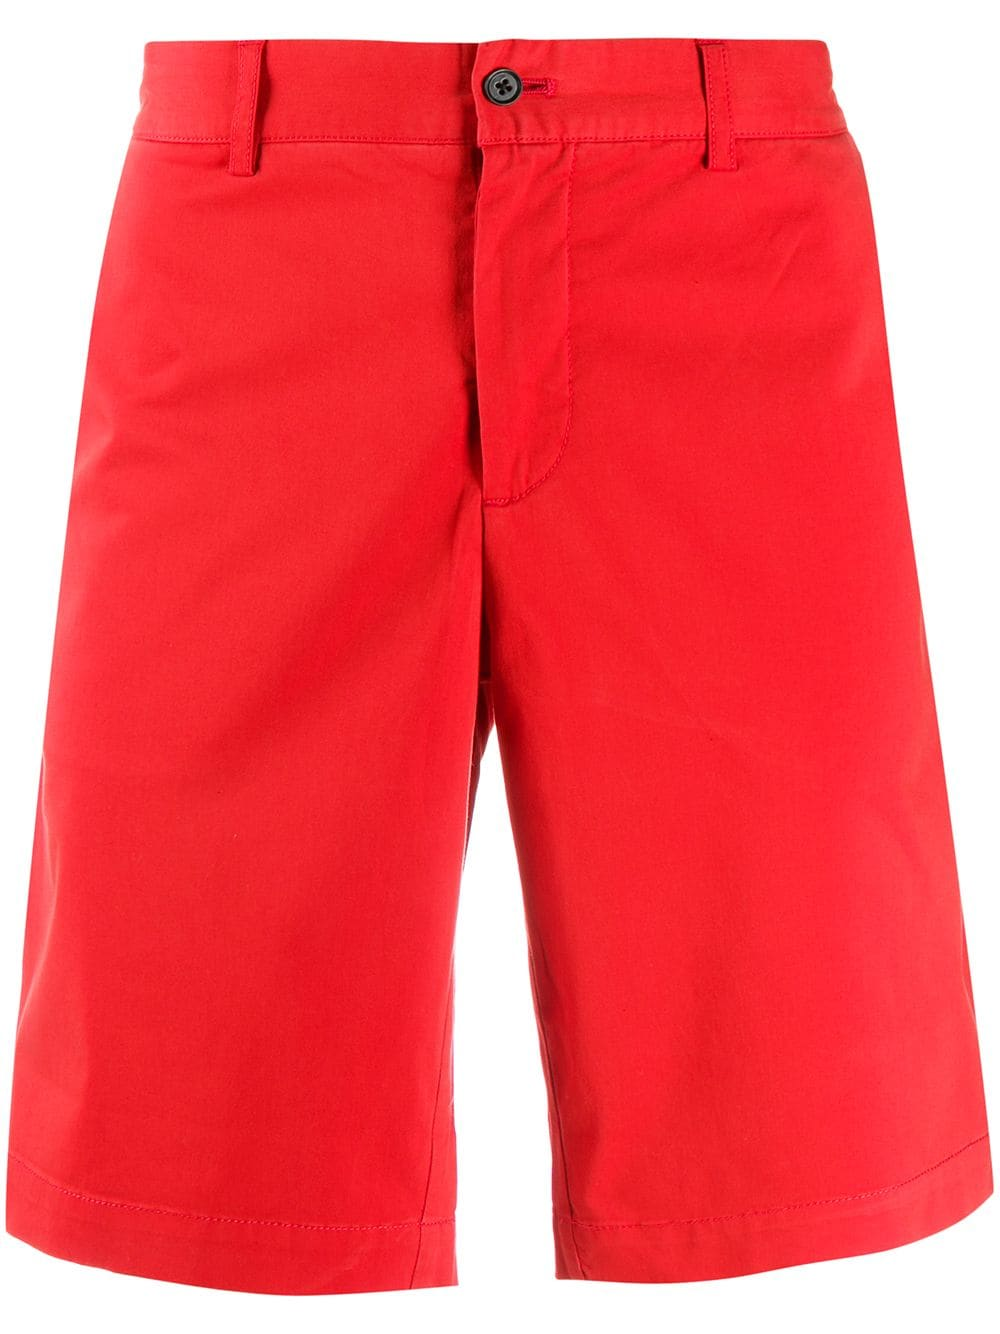 6ab112af6b J.Lindeberg Nathan deck shorts - Red in 2019 | Products | Bermuda ...